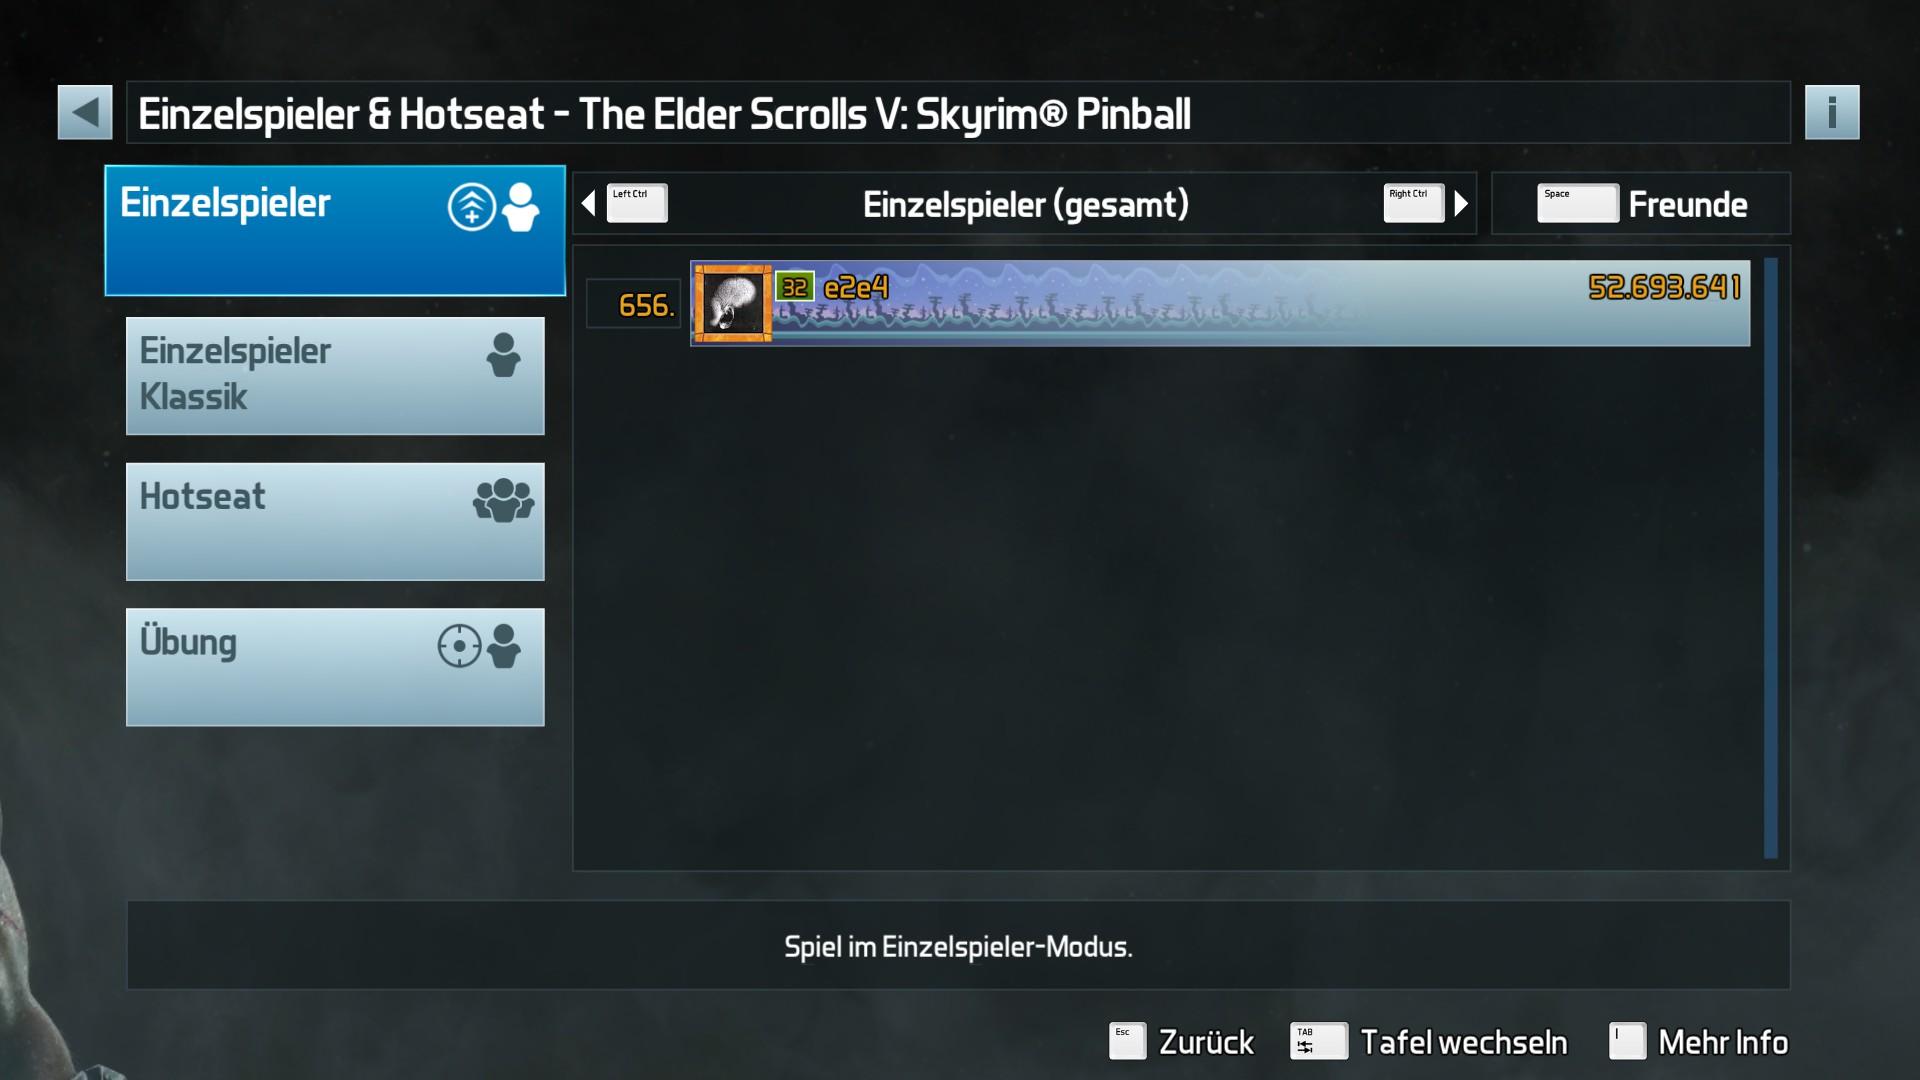 e2e4: Pinball FX3: The Elder Scrolls V: Skyrim Pinball (PC) 52,693,641 points on 2017-10-16 12:57:24